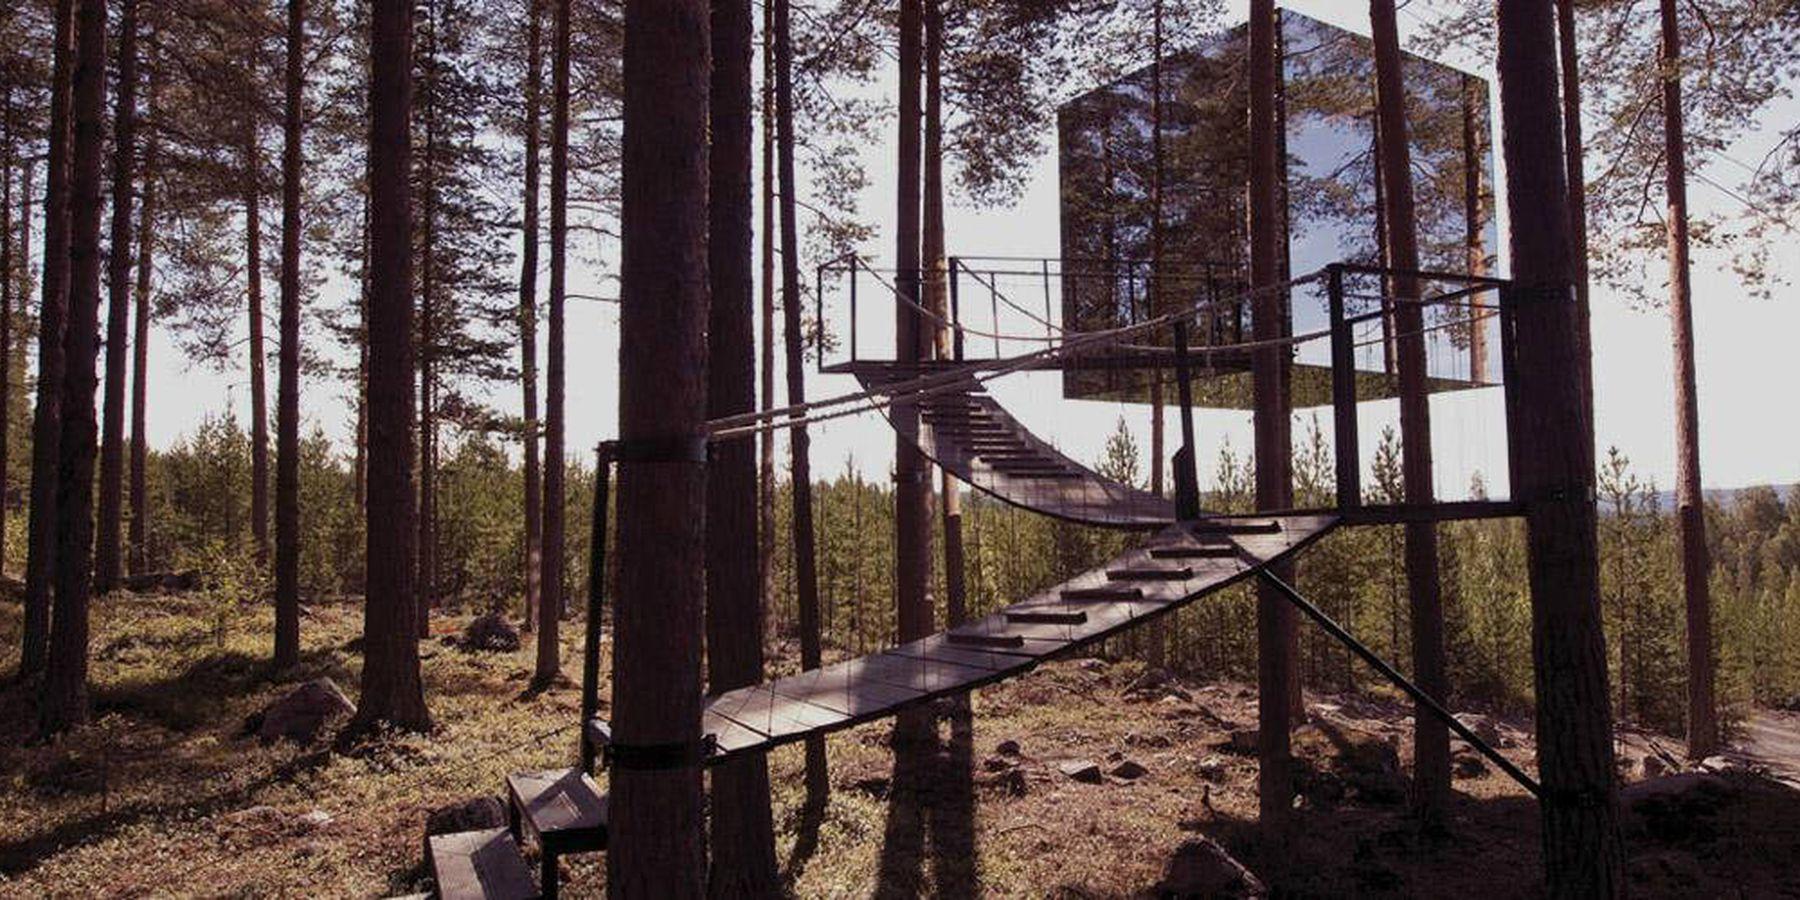 Treehotel - Doets Reizen - Vakantie in Zweden - Credits Visit Treehotel.nl